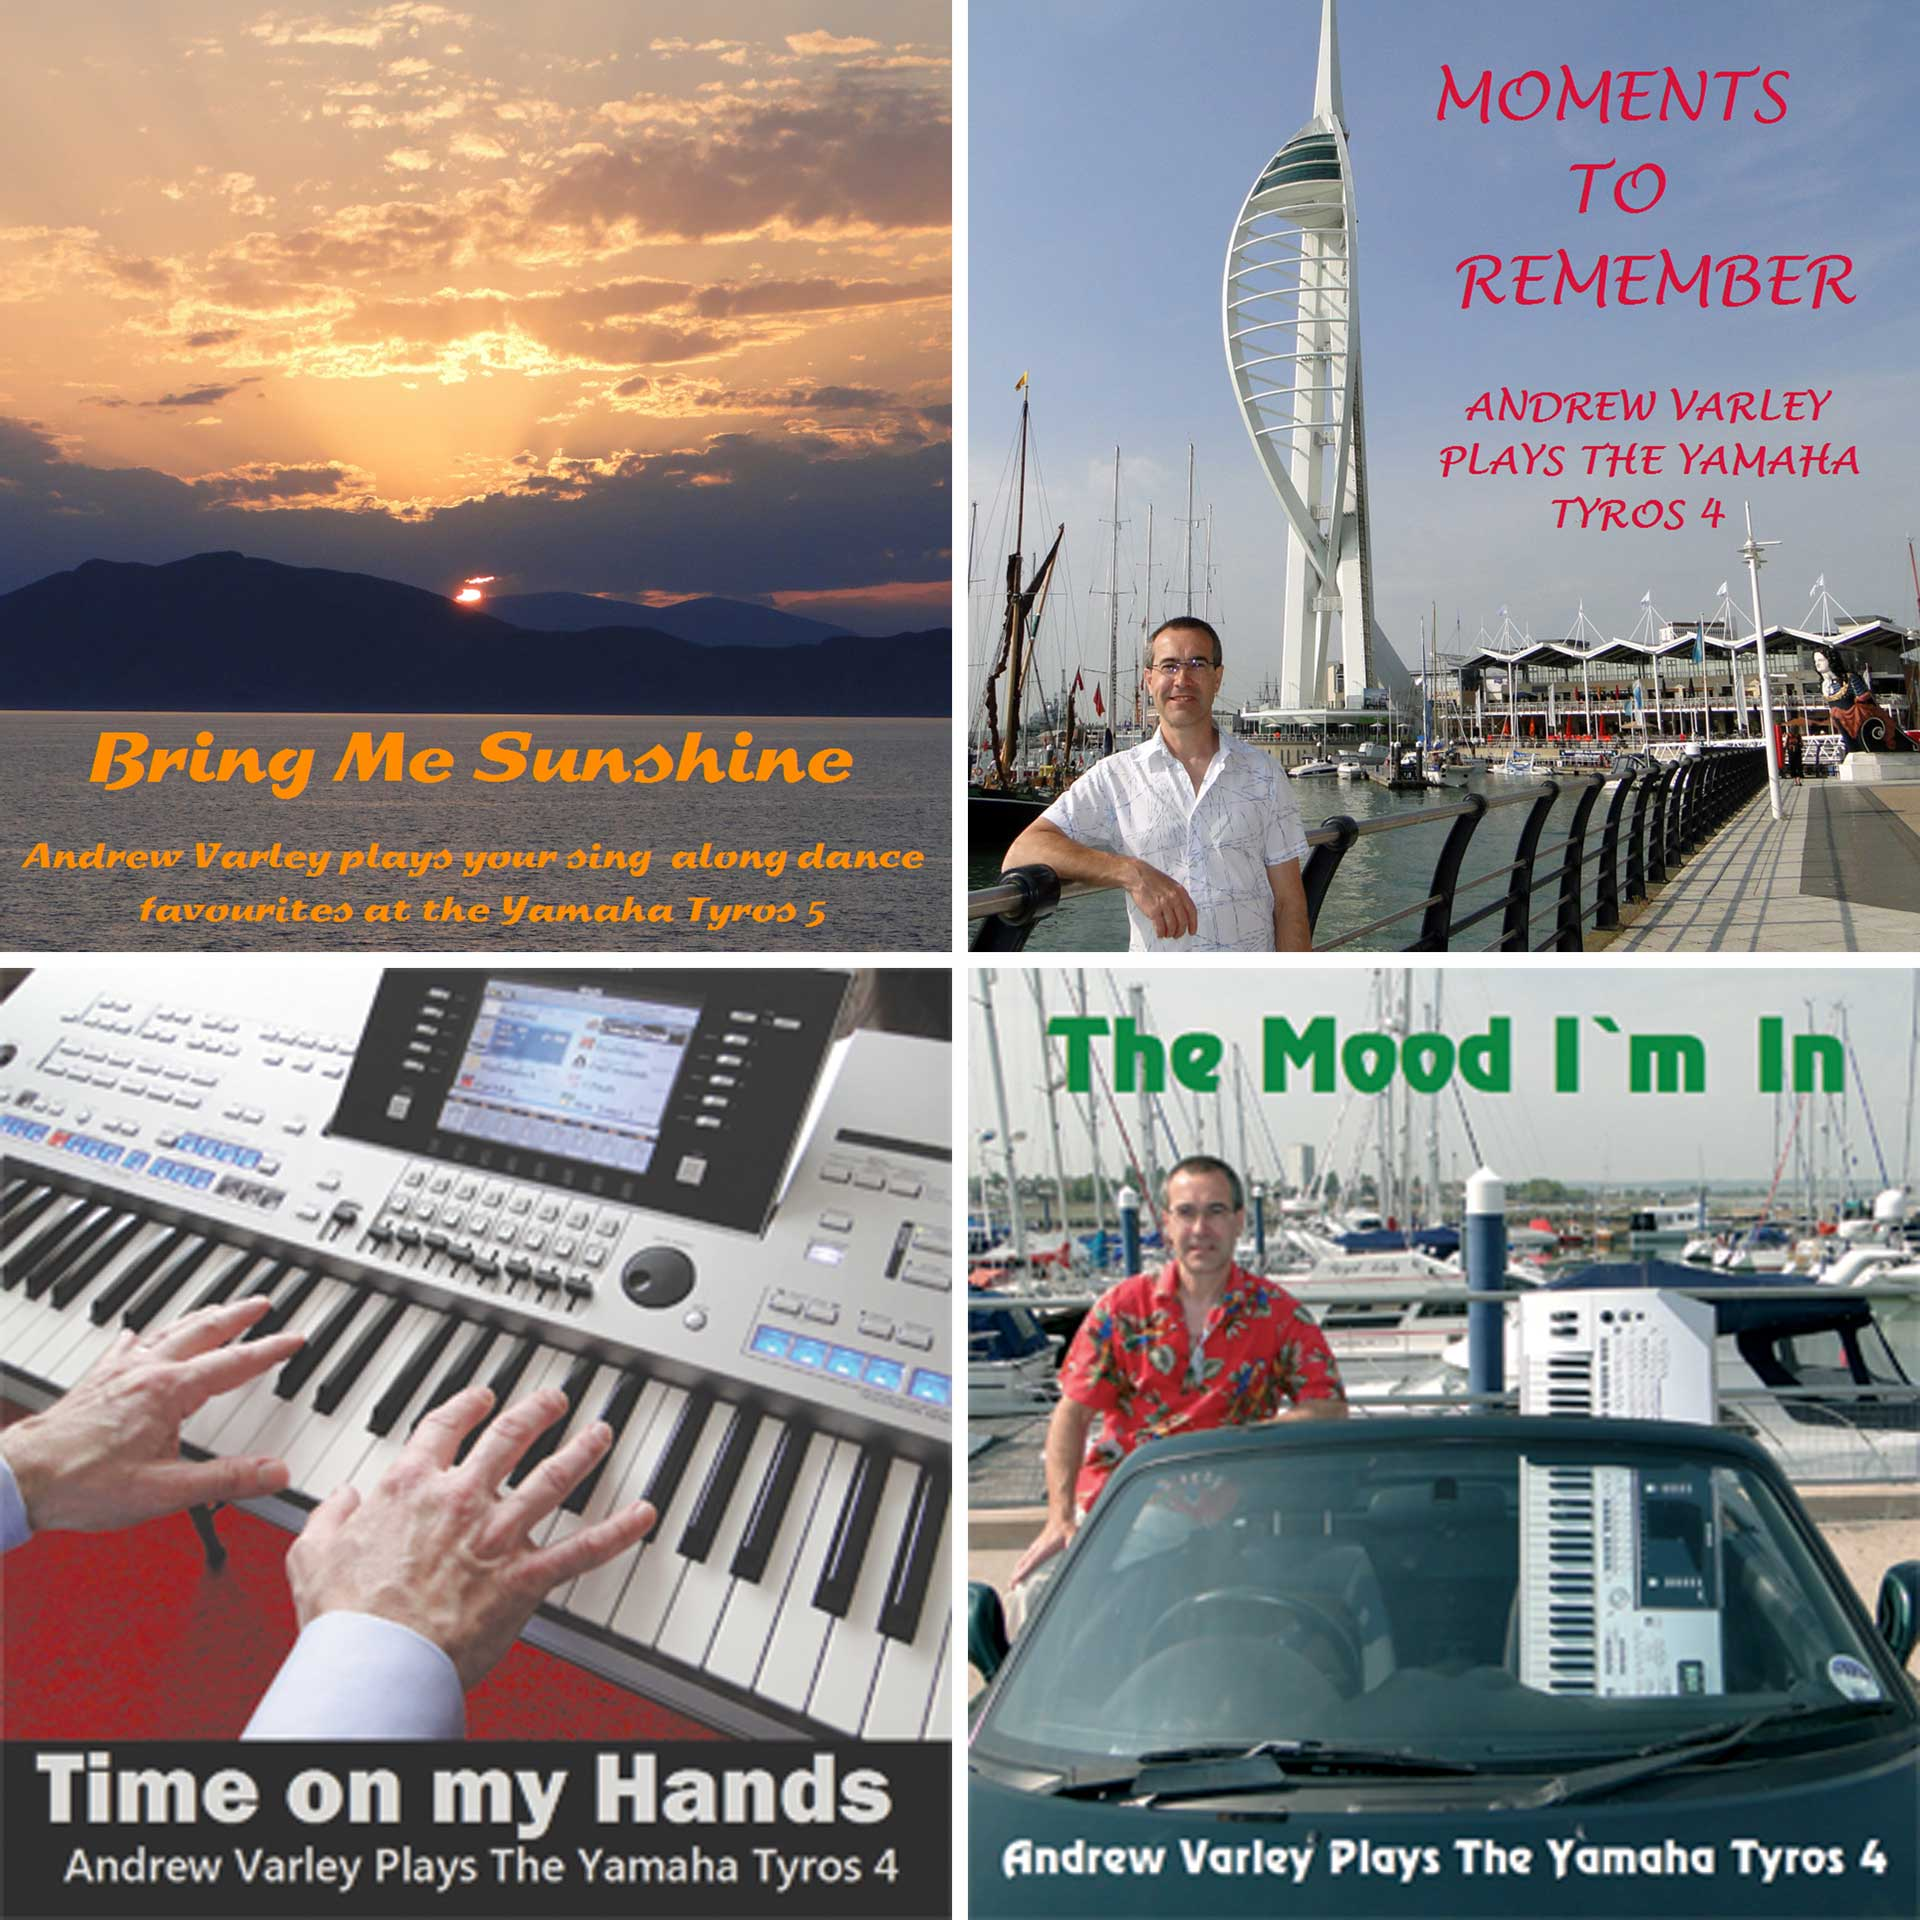 Andrew Varley CDs